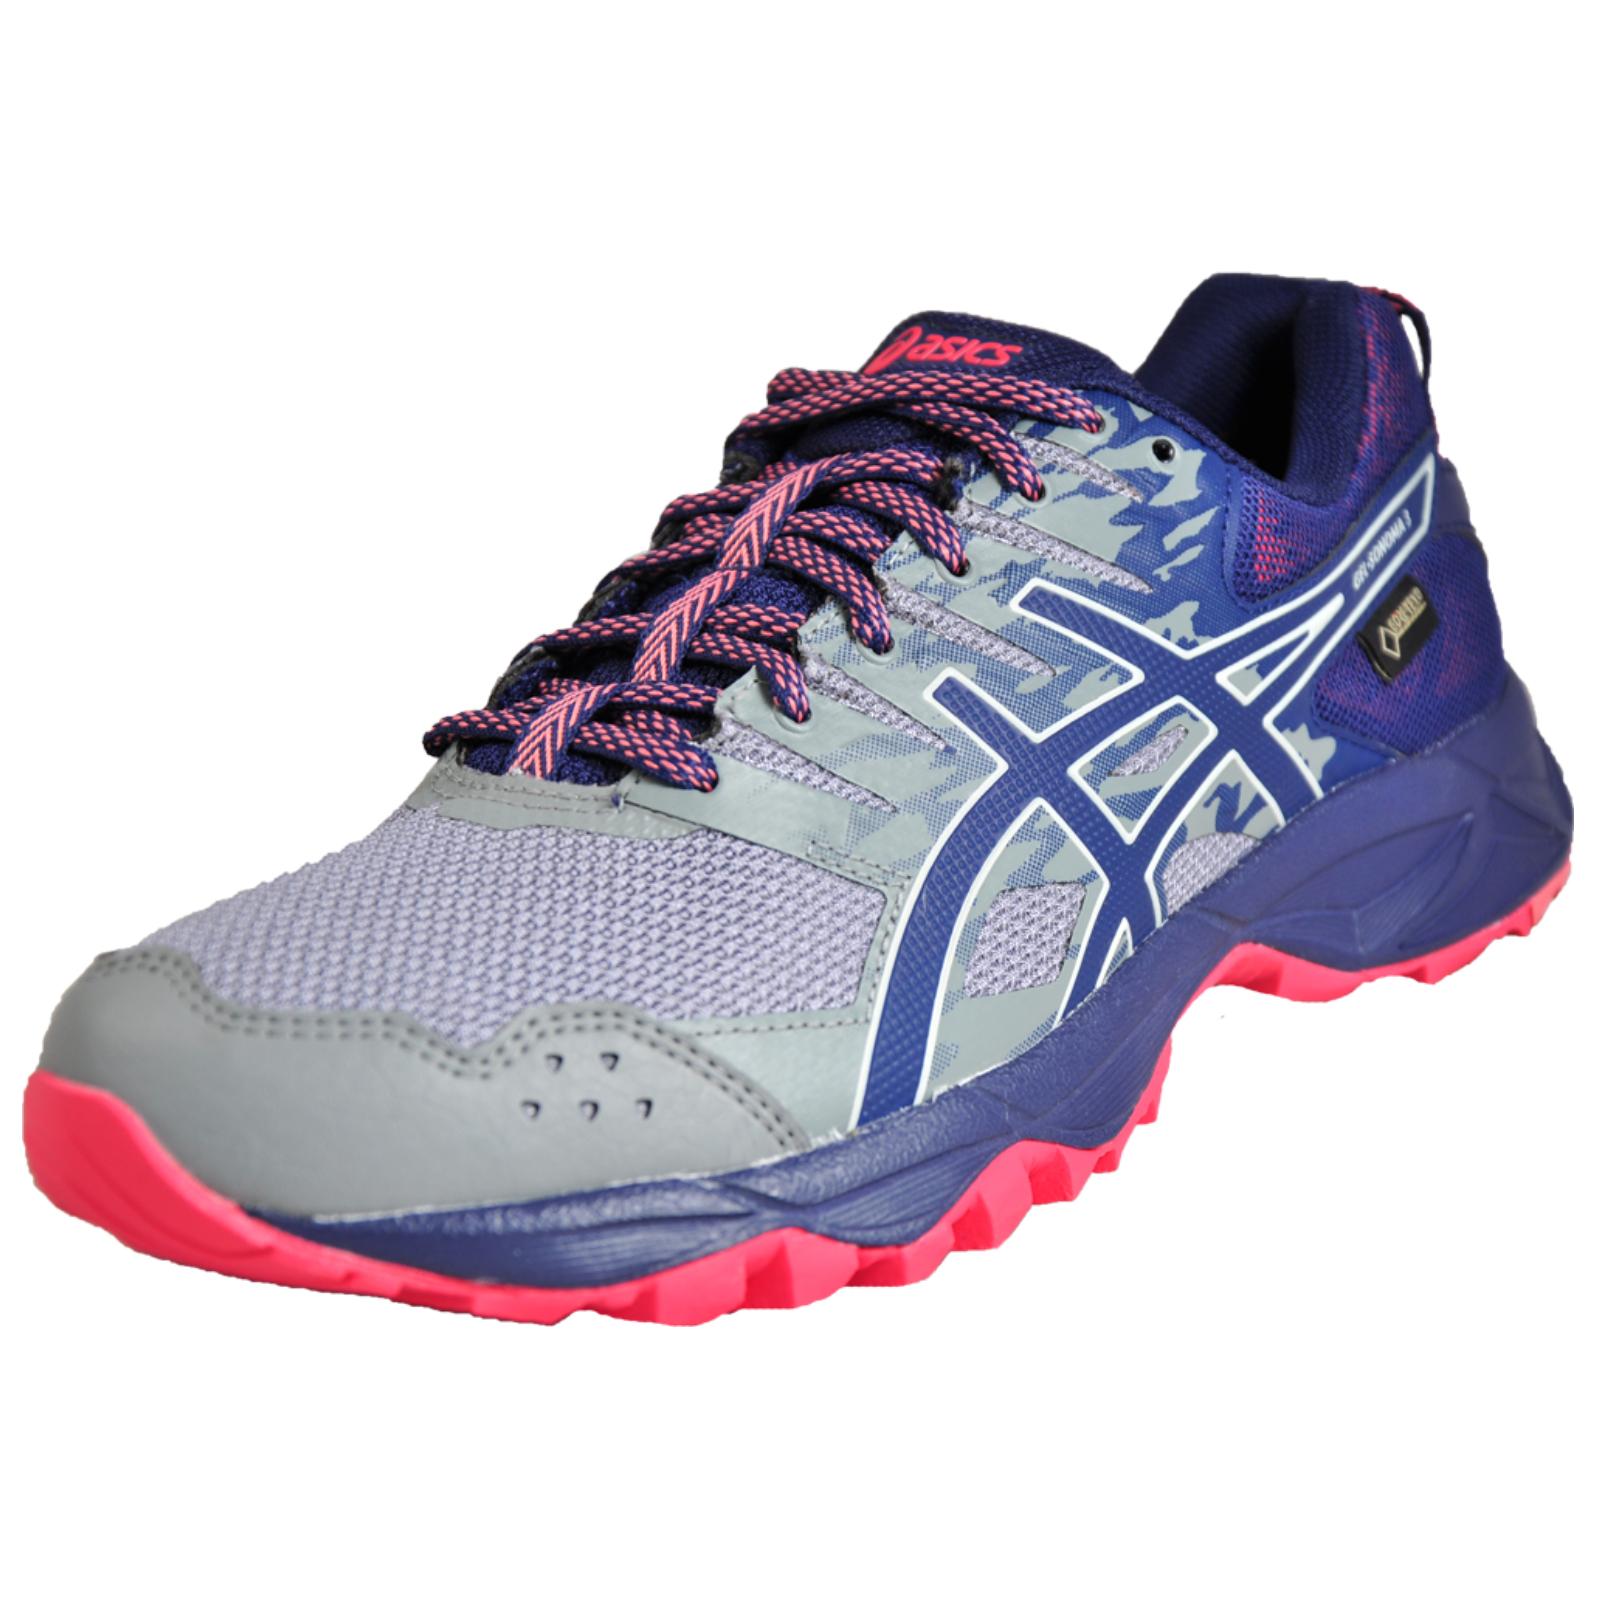 d3847be84953b Detalles acerca de Asics Gel Sonoma 3 GTX Goretex impermeable para mujer  All Terrain Trail Running Shoe- mostrar título original